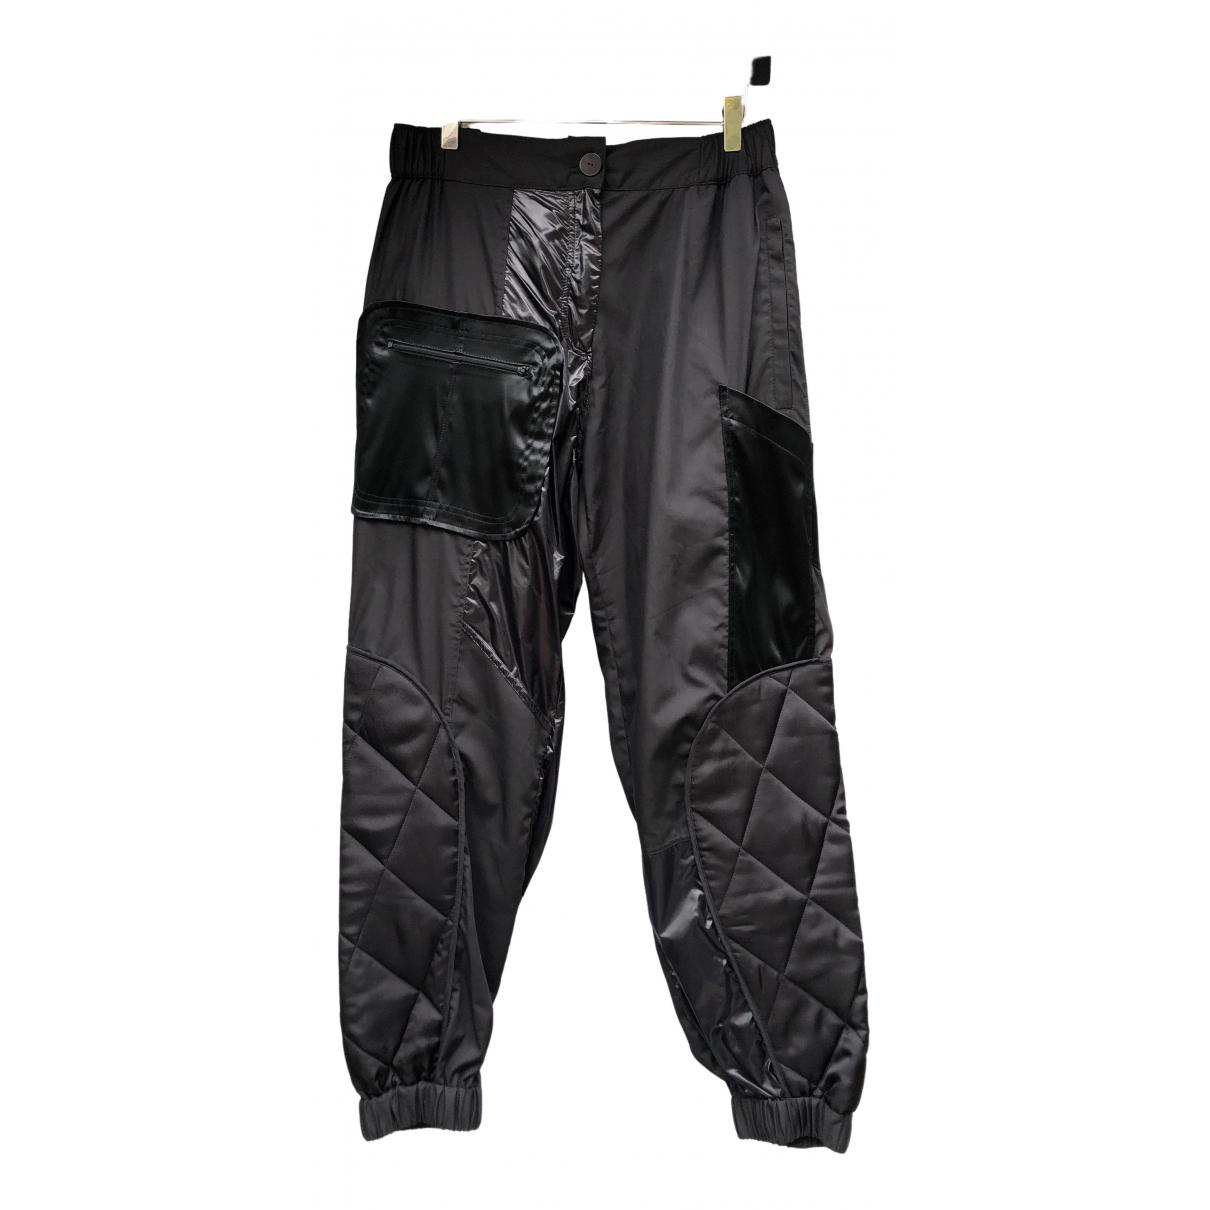 Pantalon en Algodon Negro Preen By Thornton Bregazzi